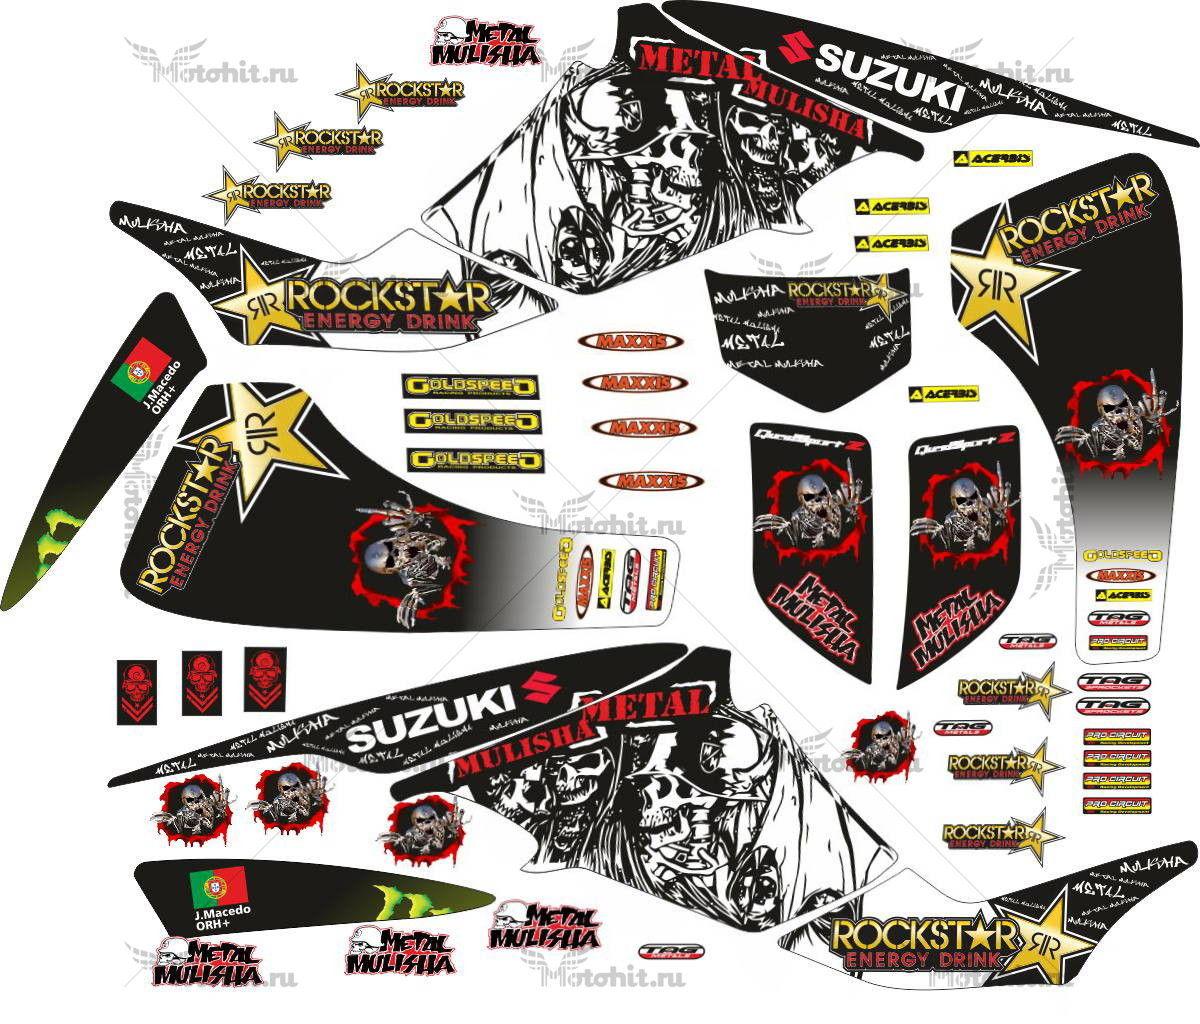 Комплект наклеек SUZUKI LTZ-400 ROCKSTAR-METAL-MULISHA